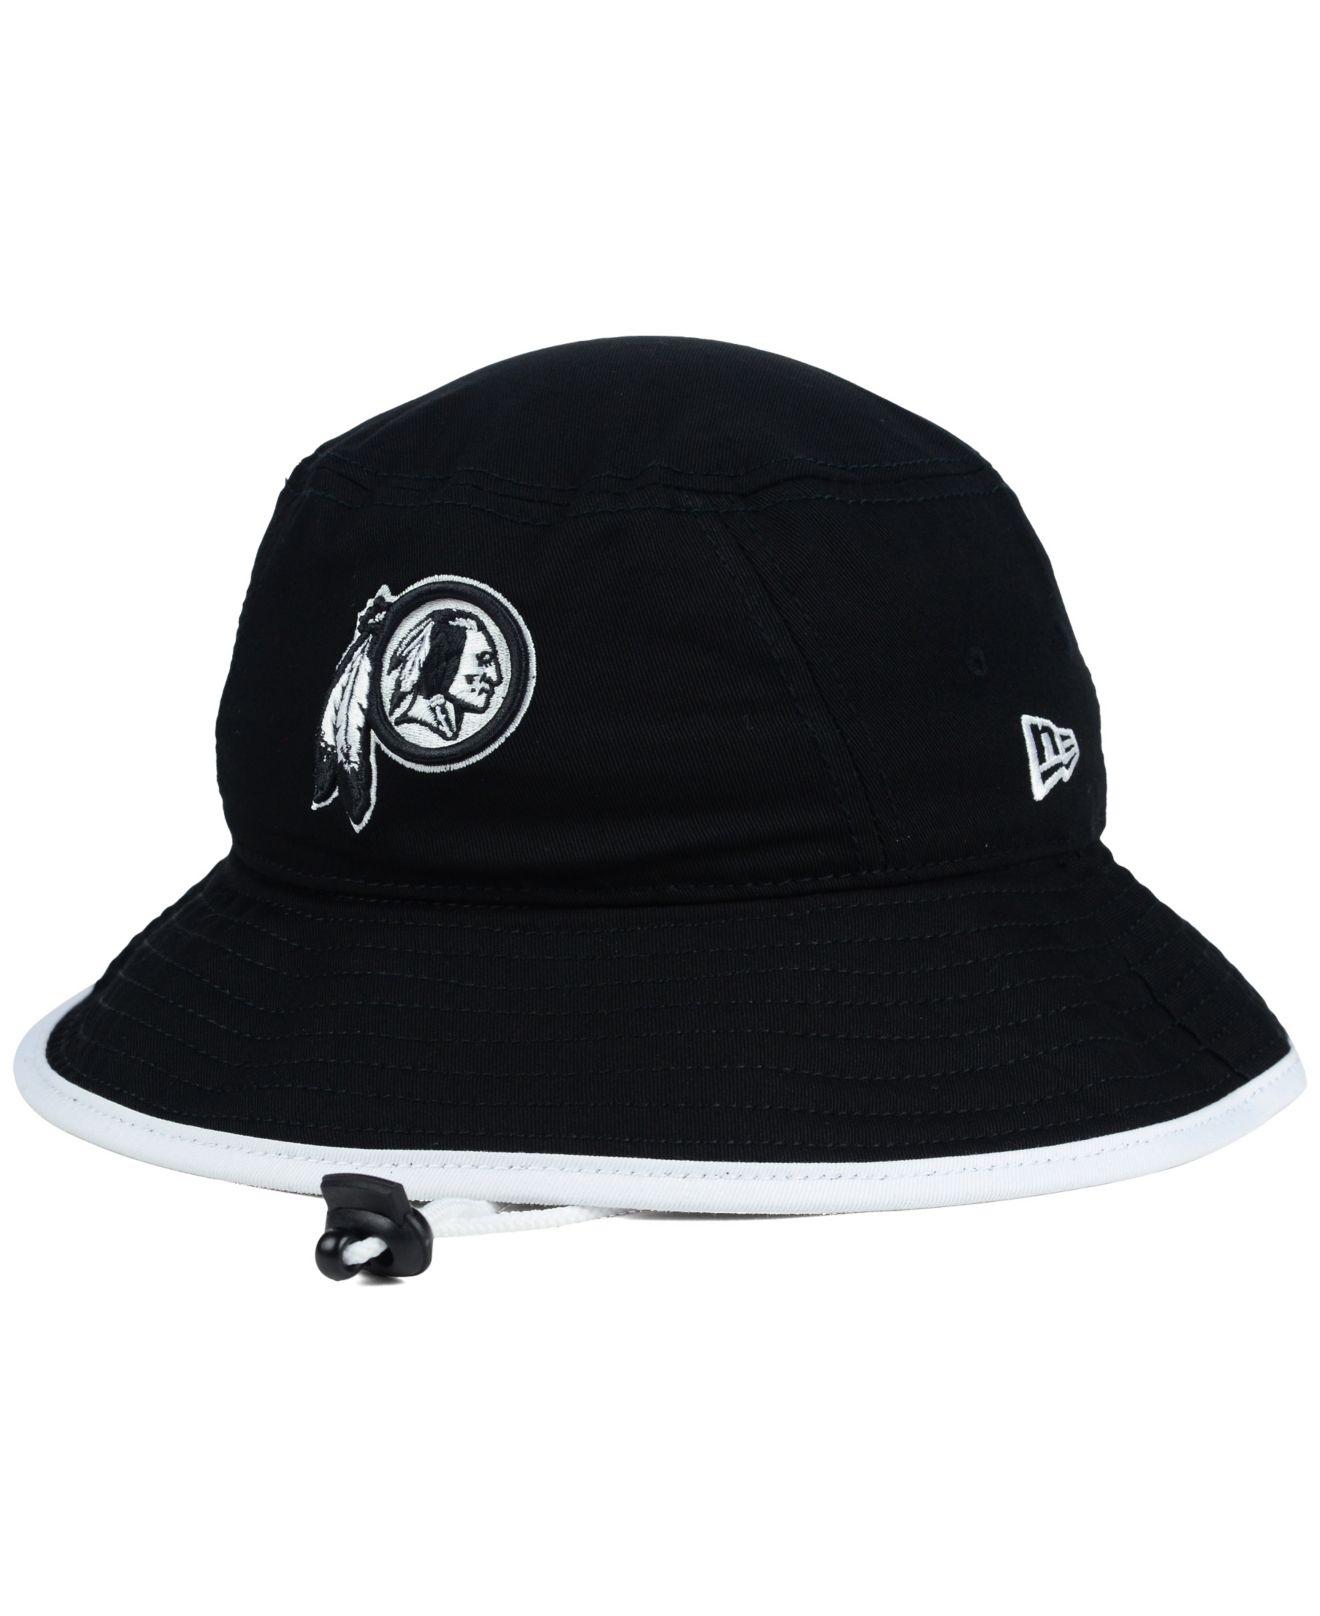 Lyst - KTZ Washington Redskins Nfl Black White Bucket Hat in Black ... a303333fa96